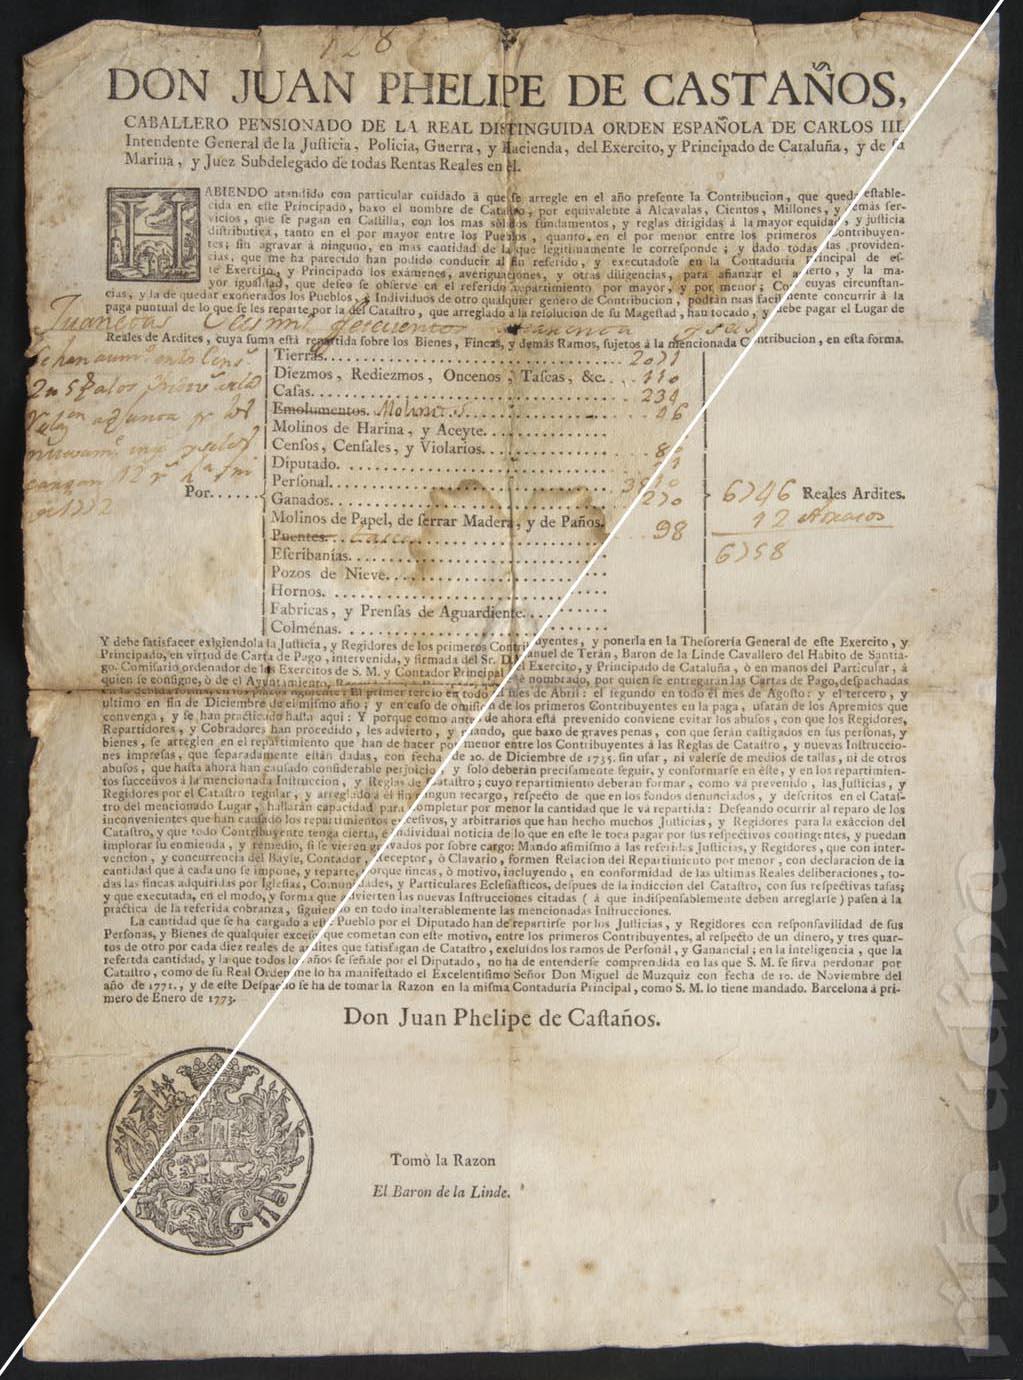 Contribució del cavaller pensionat Juan Phelipe